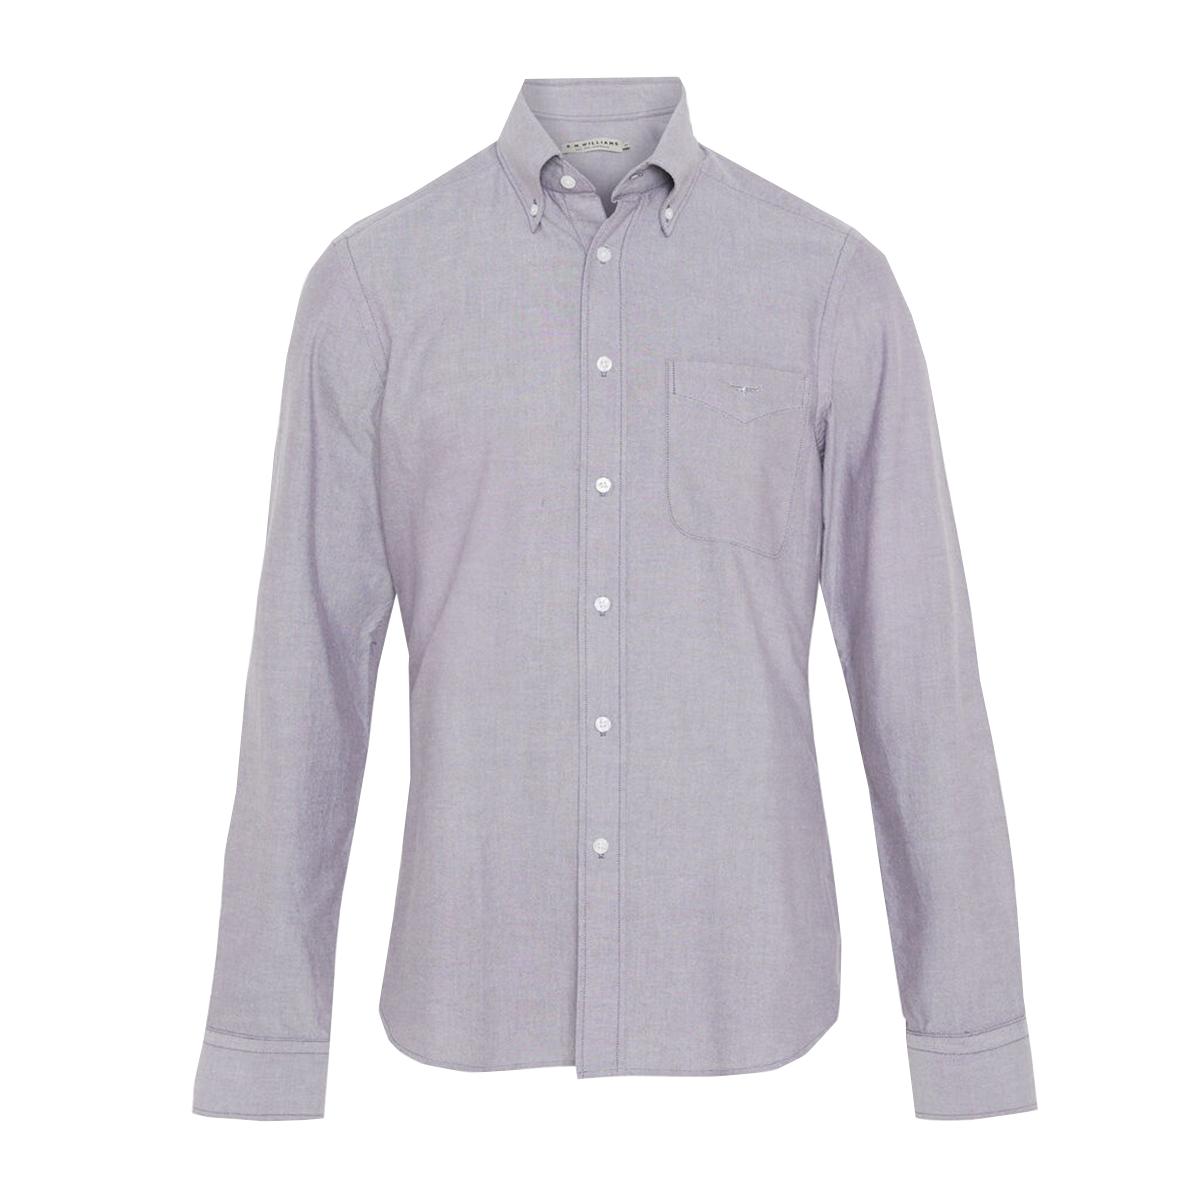 RM-Williams-Jervis-Button-Down-Shirt-Grey-Blue